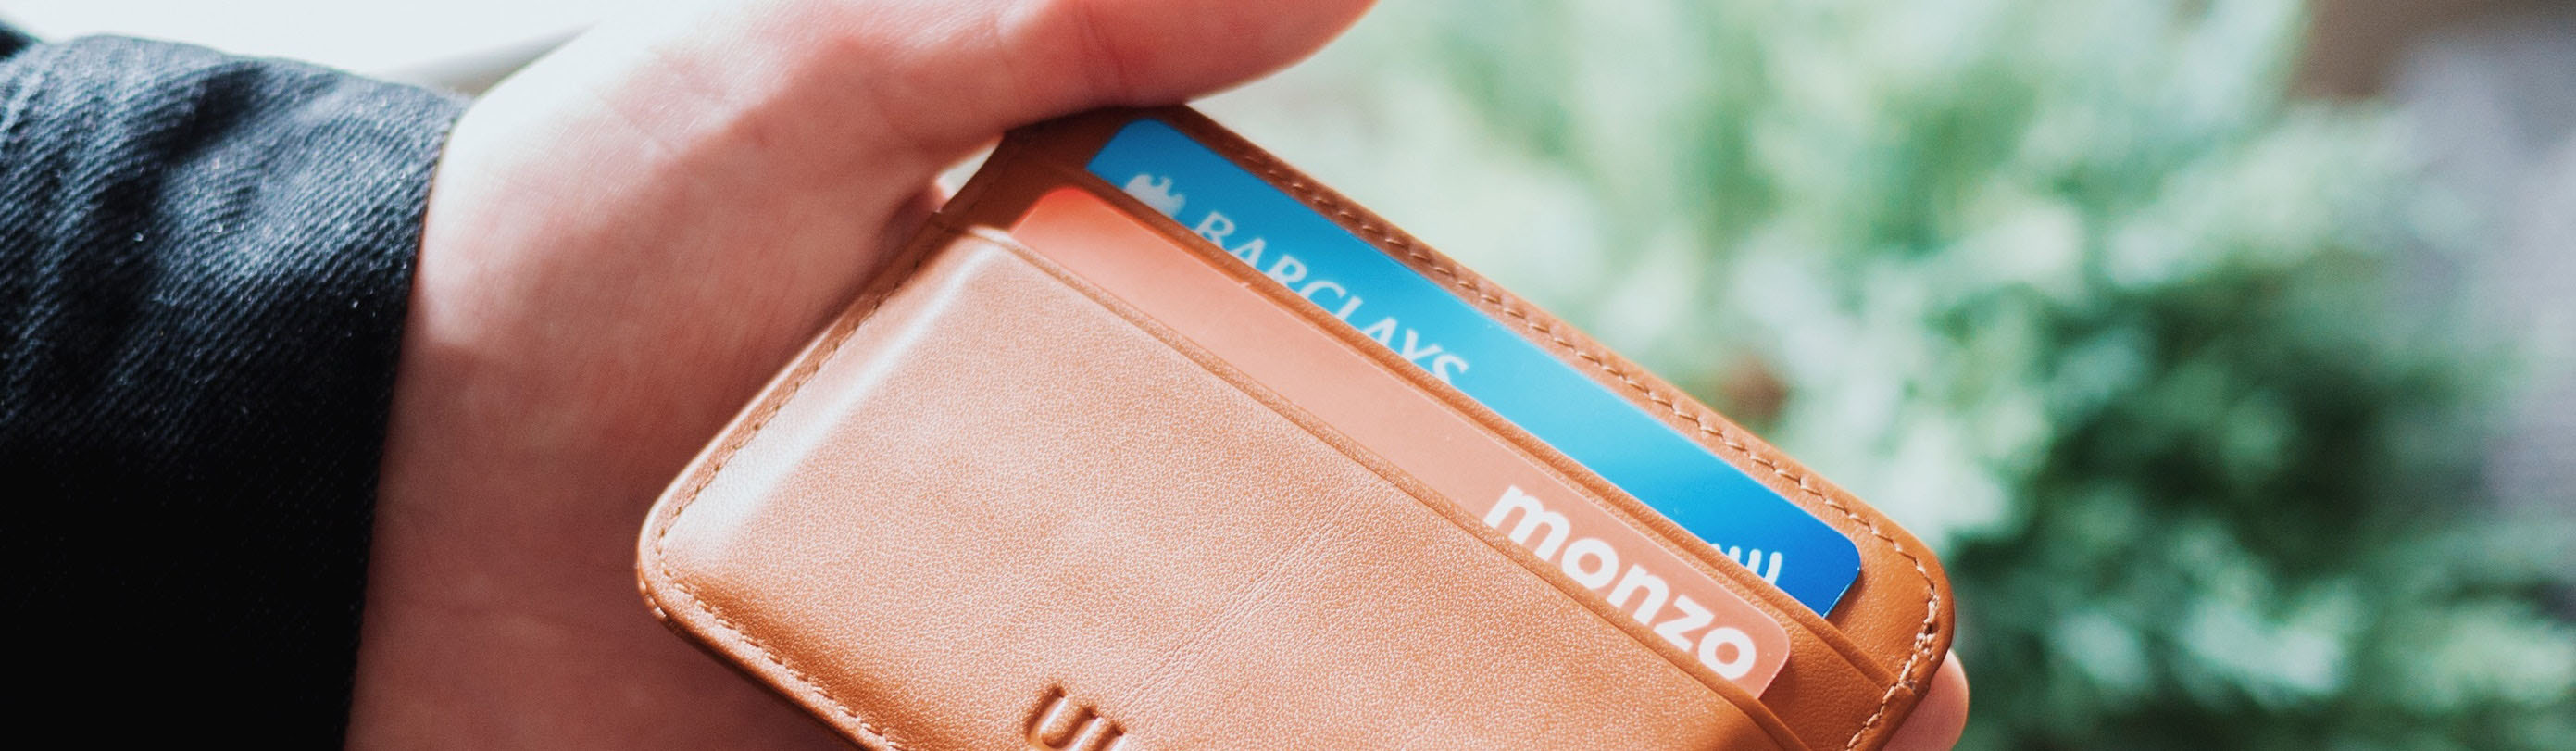 laybuy-millennial-spending-habits